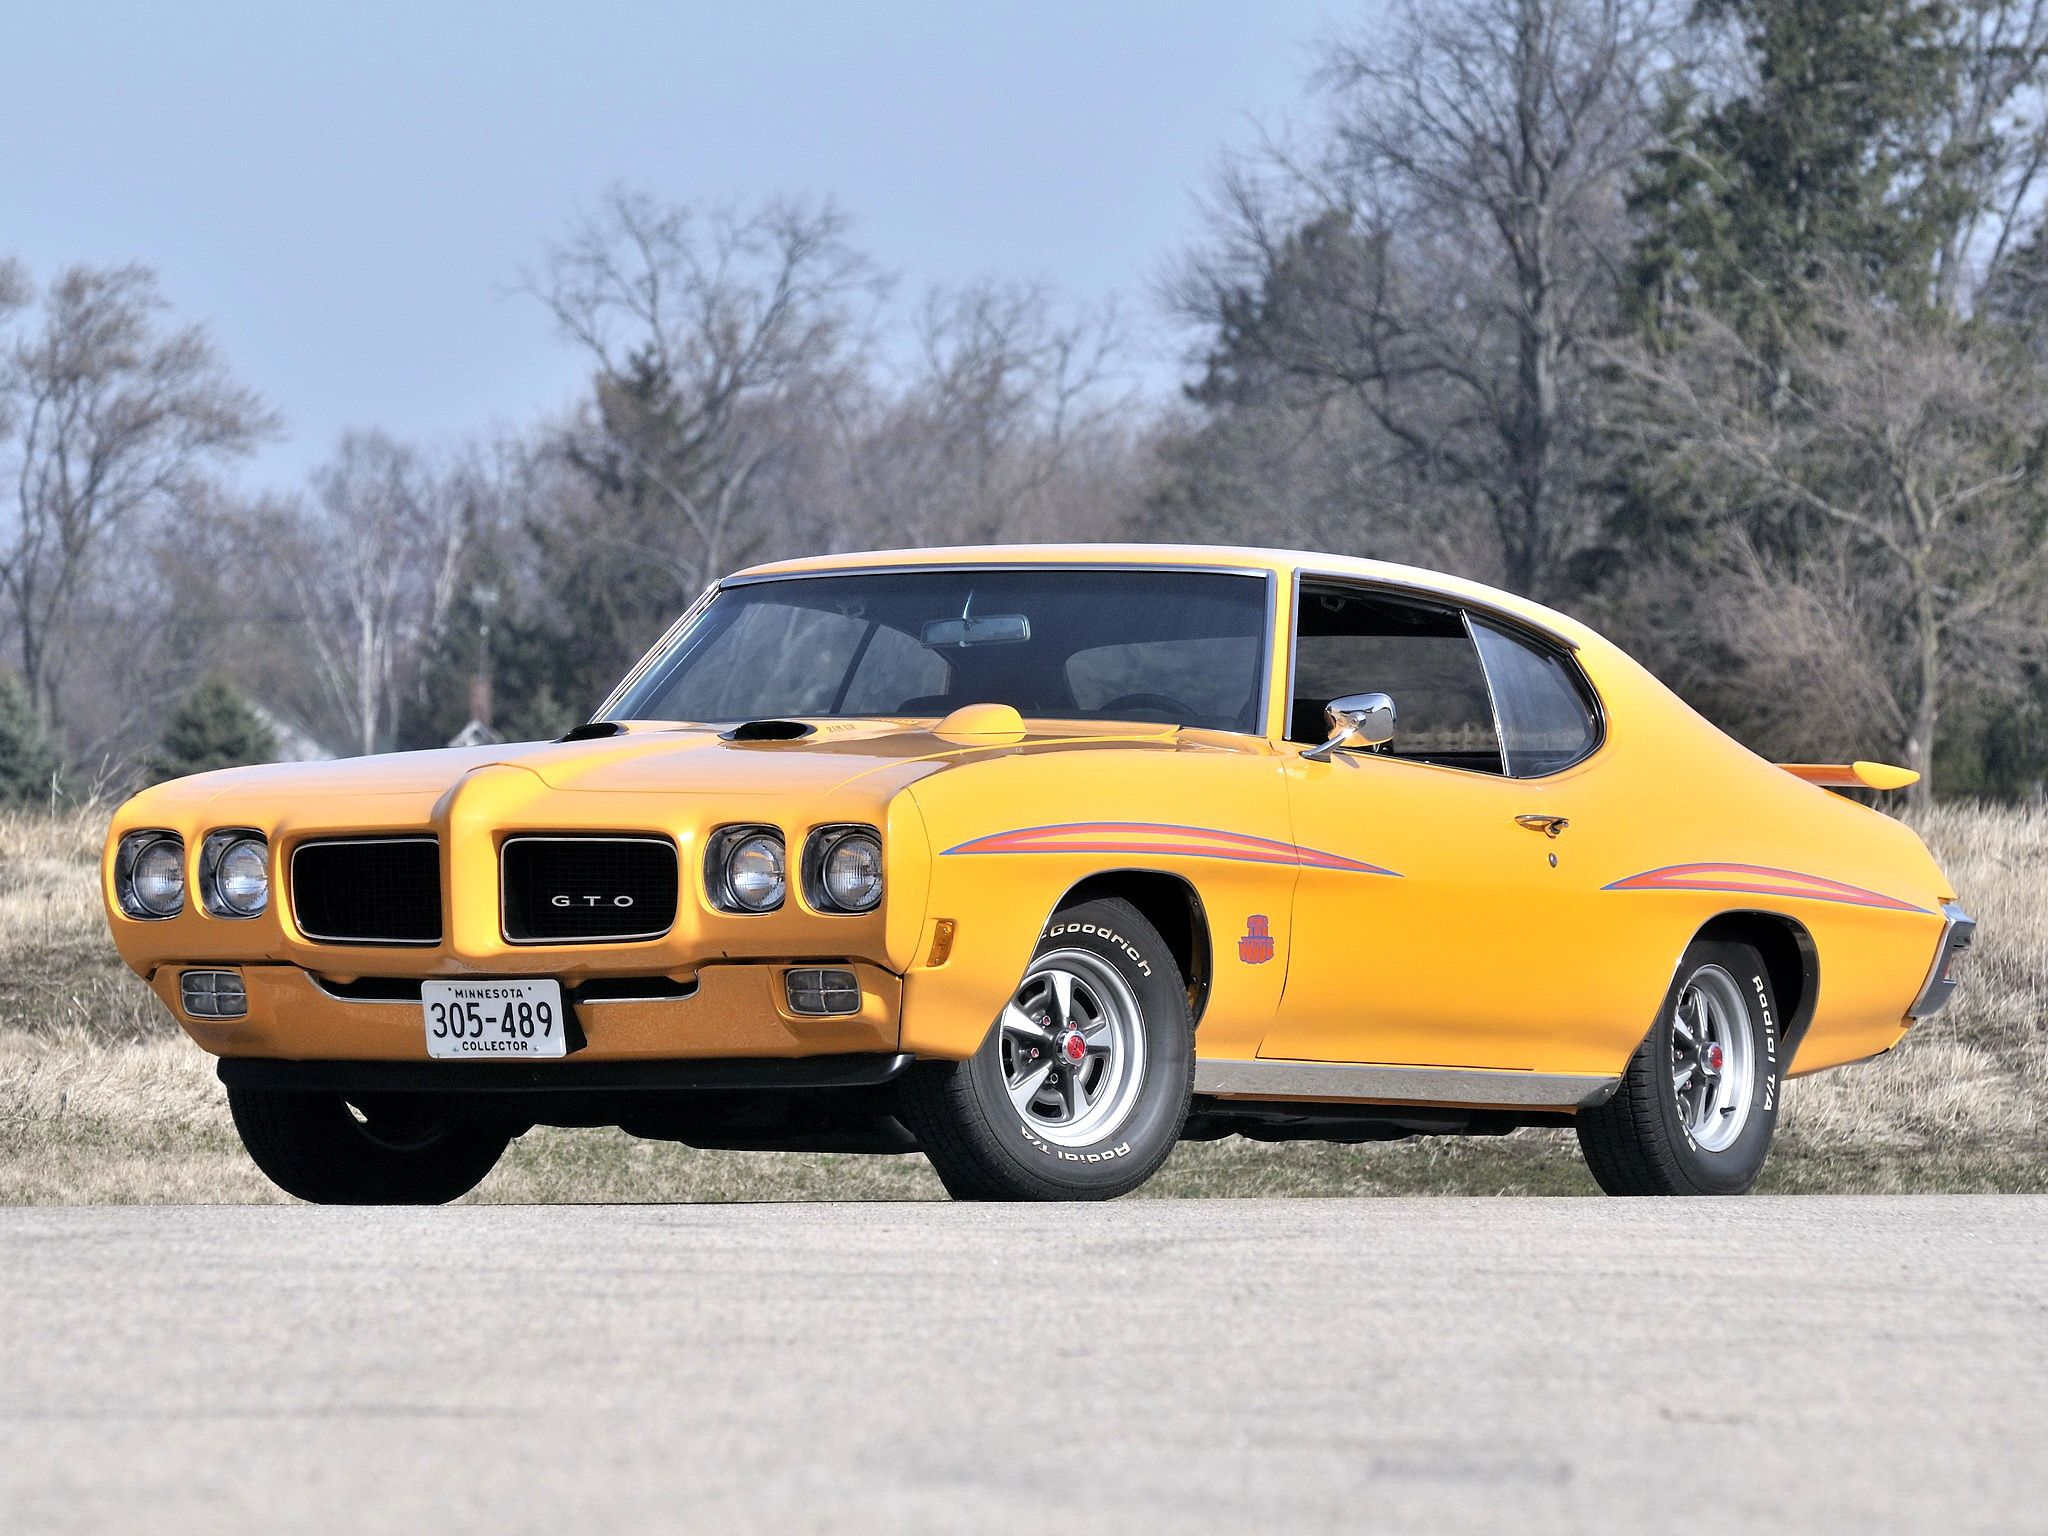 1970 pontiac gto judge ram air iv 400 370 hp 4 speed build sheet presented as lot f217 at kissimmee fl 2016 image1 gtos 68 72 pinterest pontiac